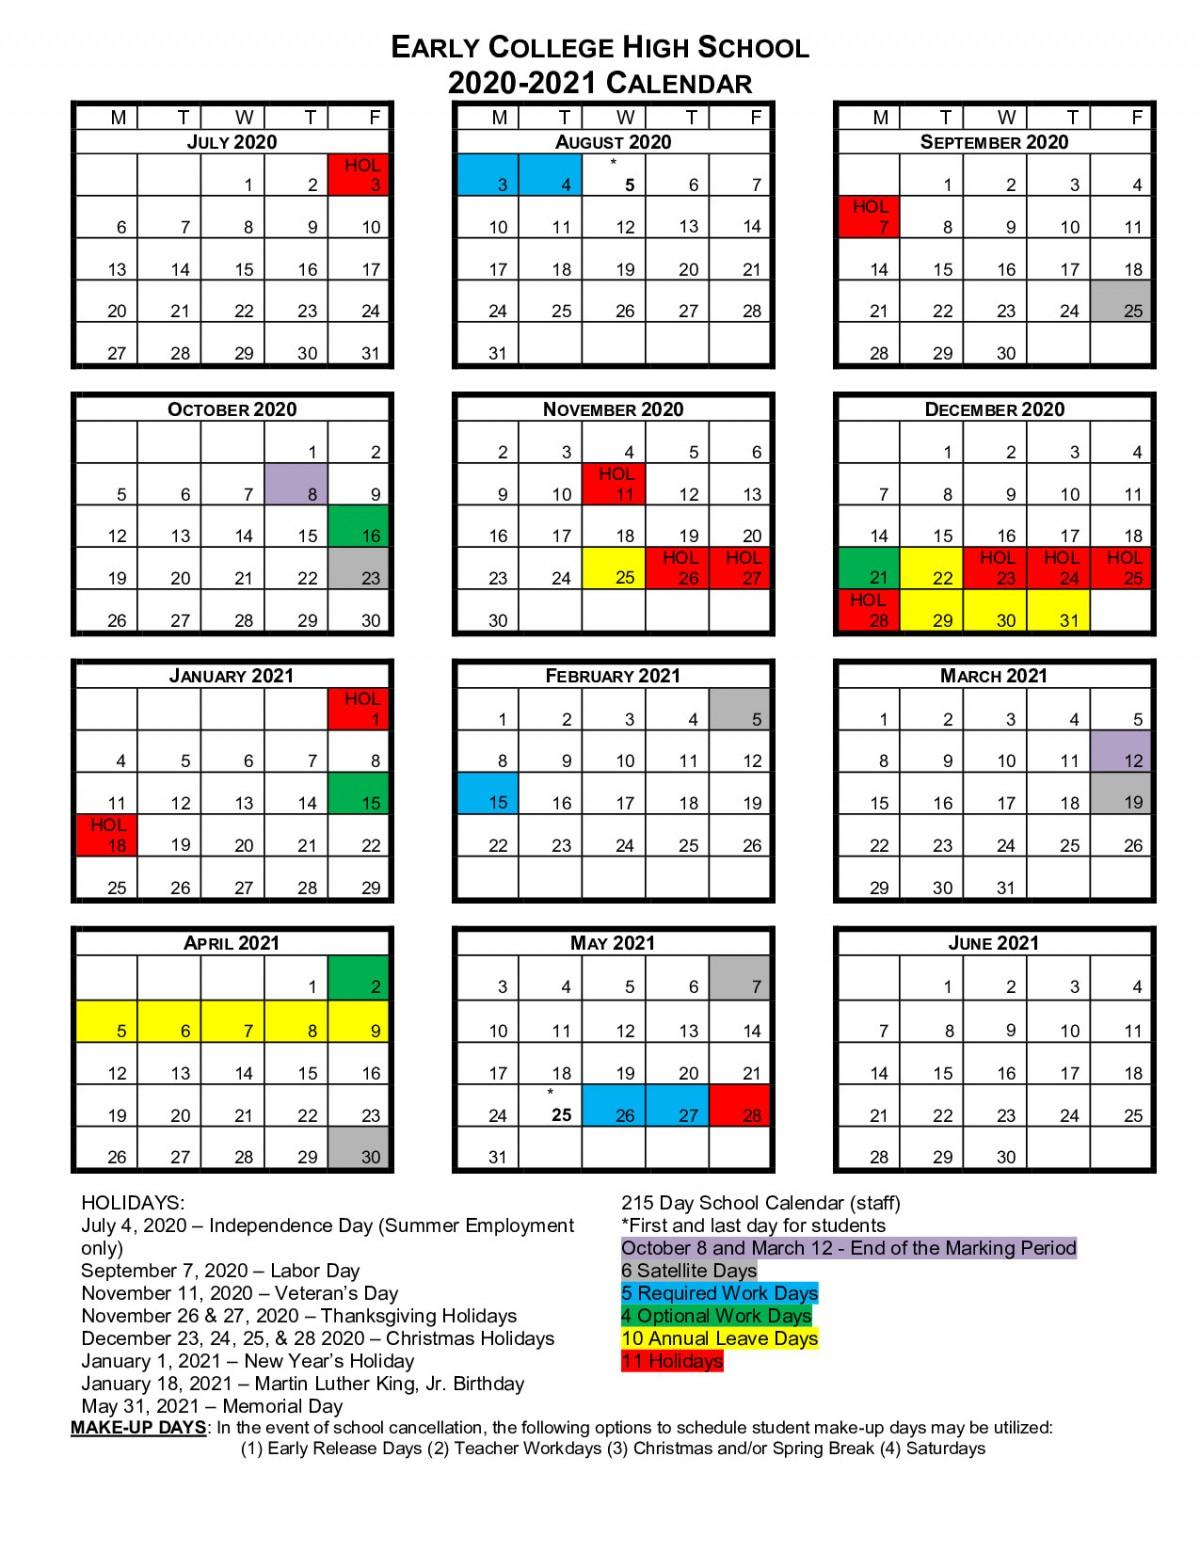 Bcs School Calendars | Beaufort County Schools with regard to East Allen County Schools Calendar